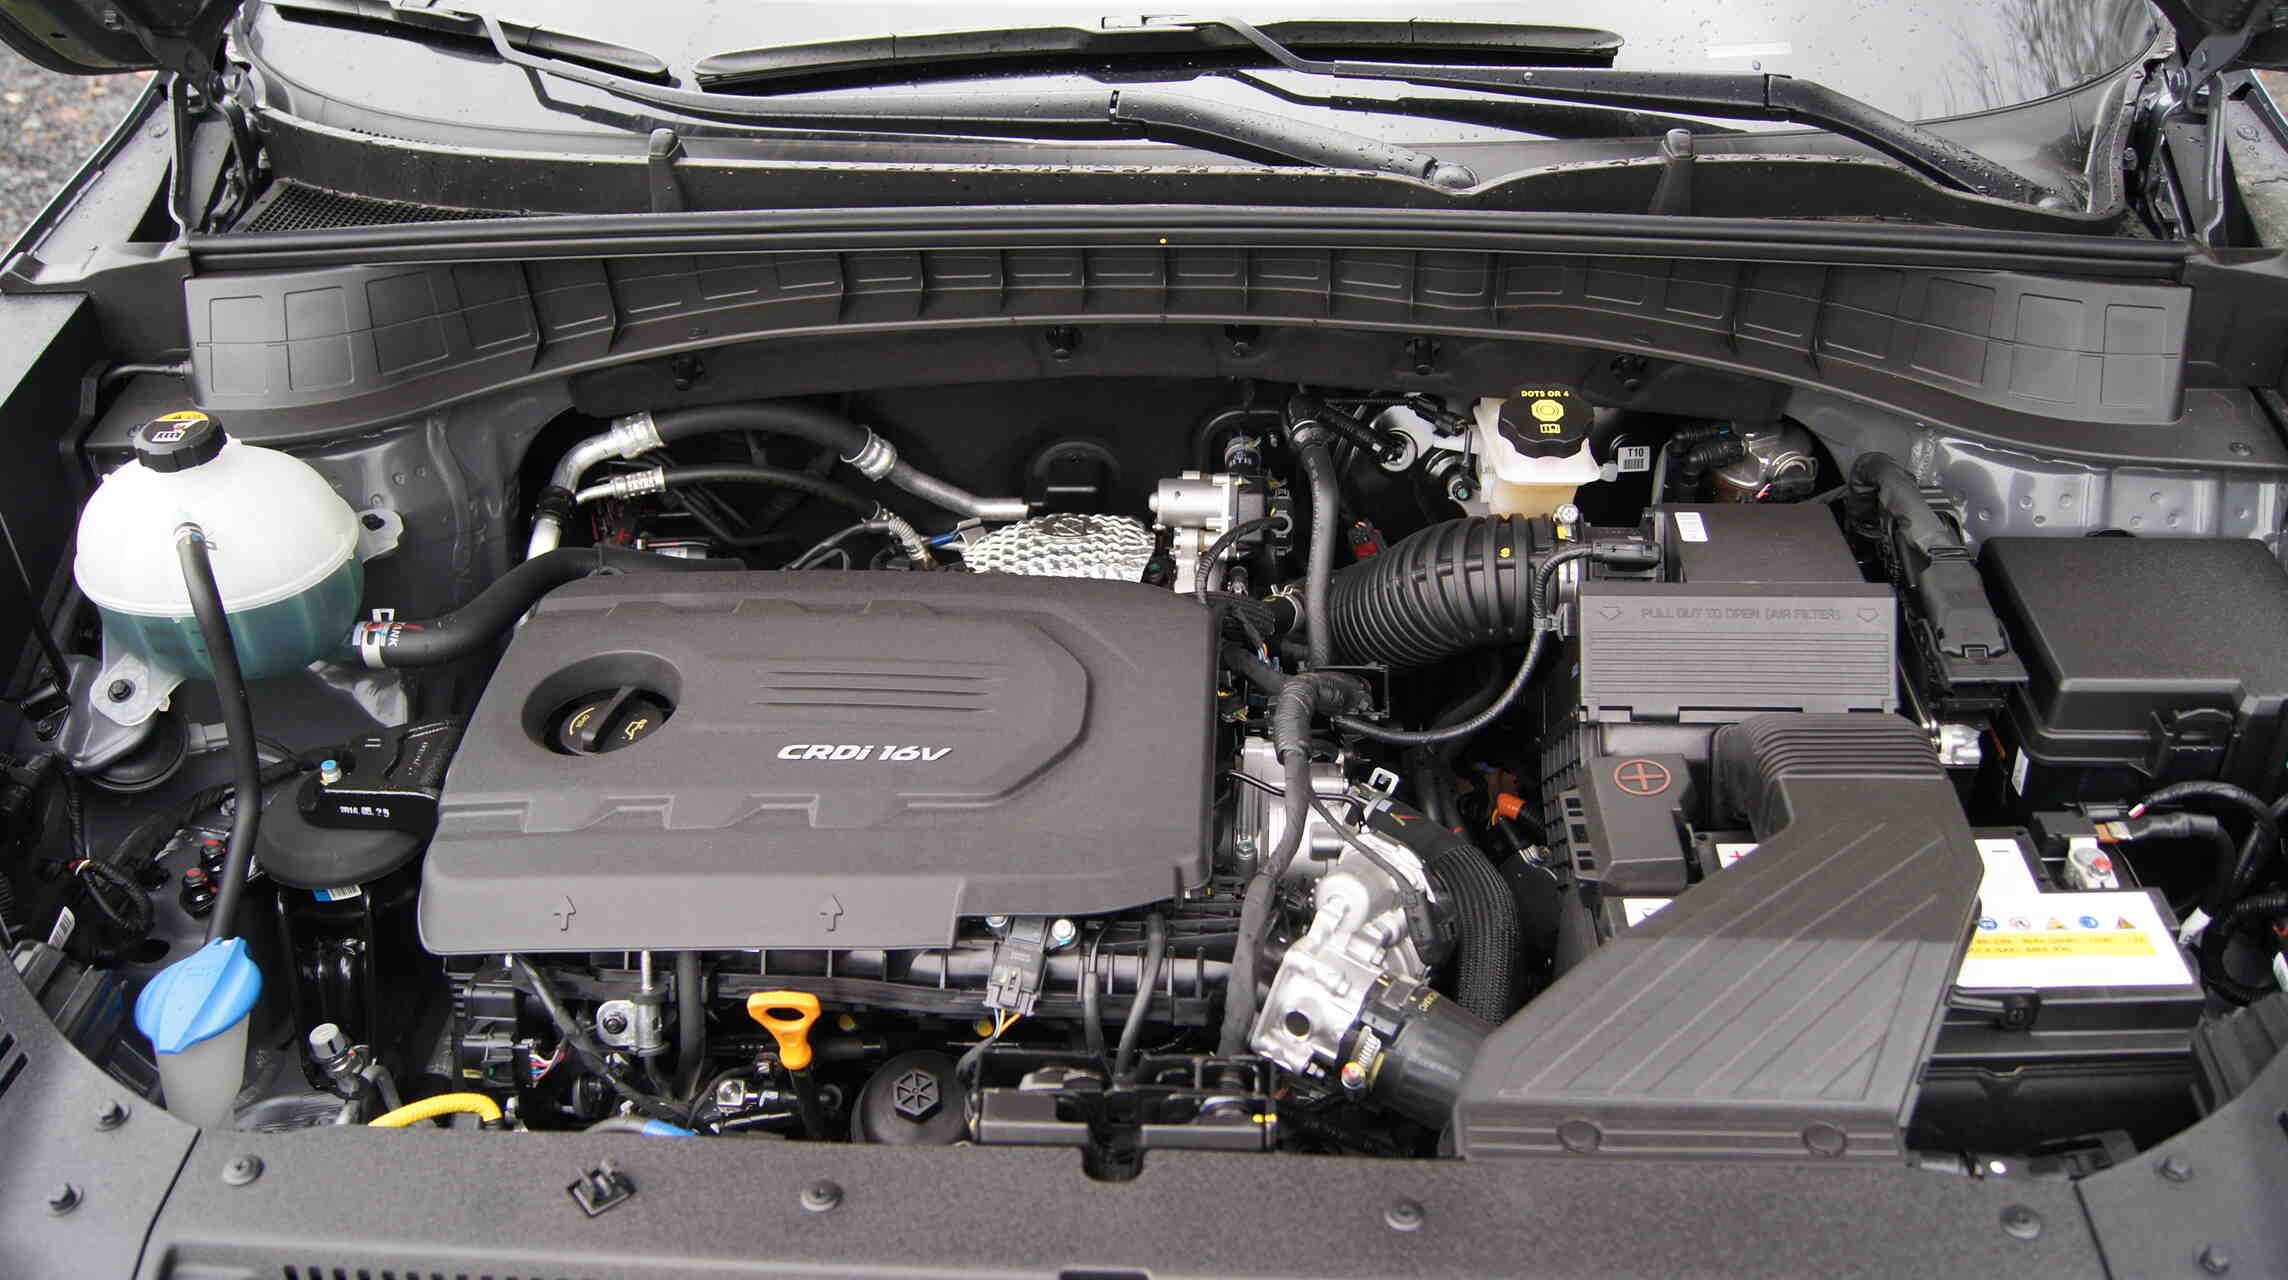 Quelle est l'origine de Hyundai?